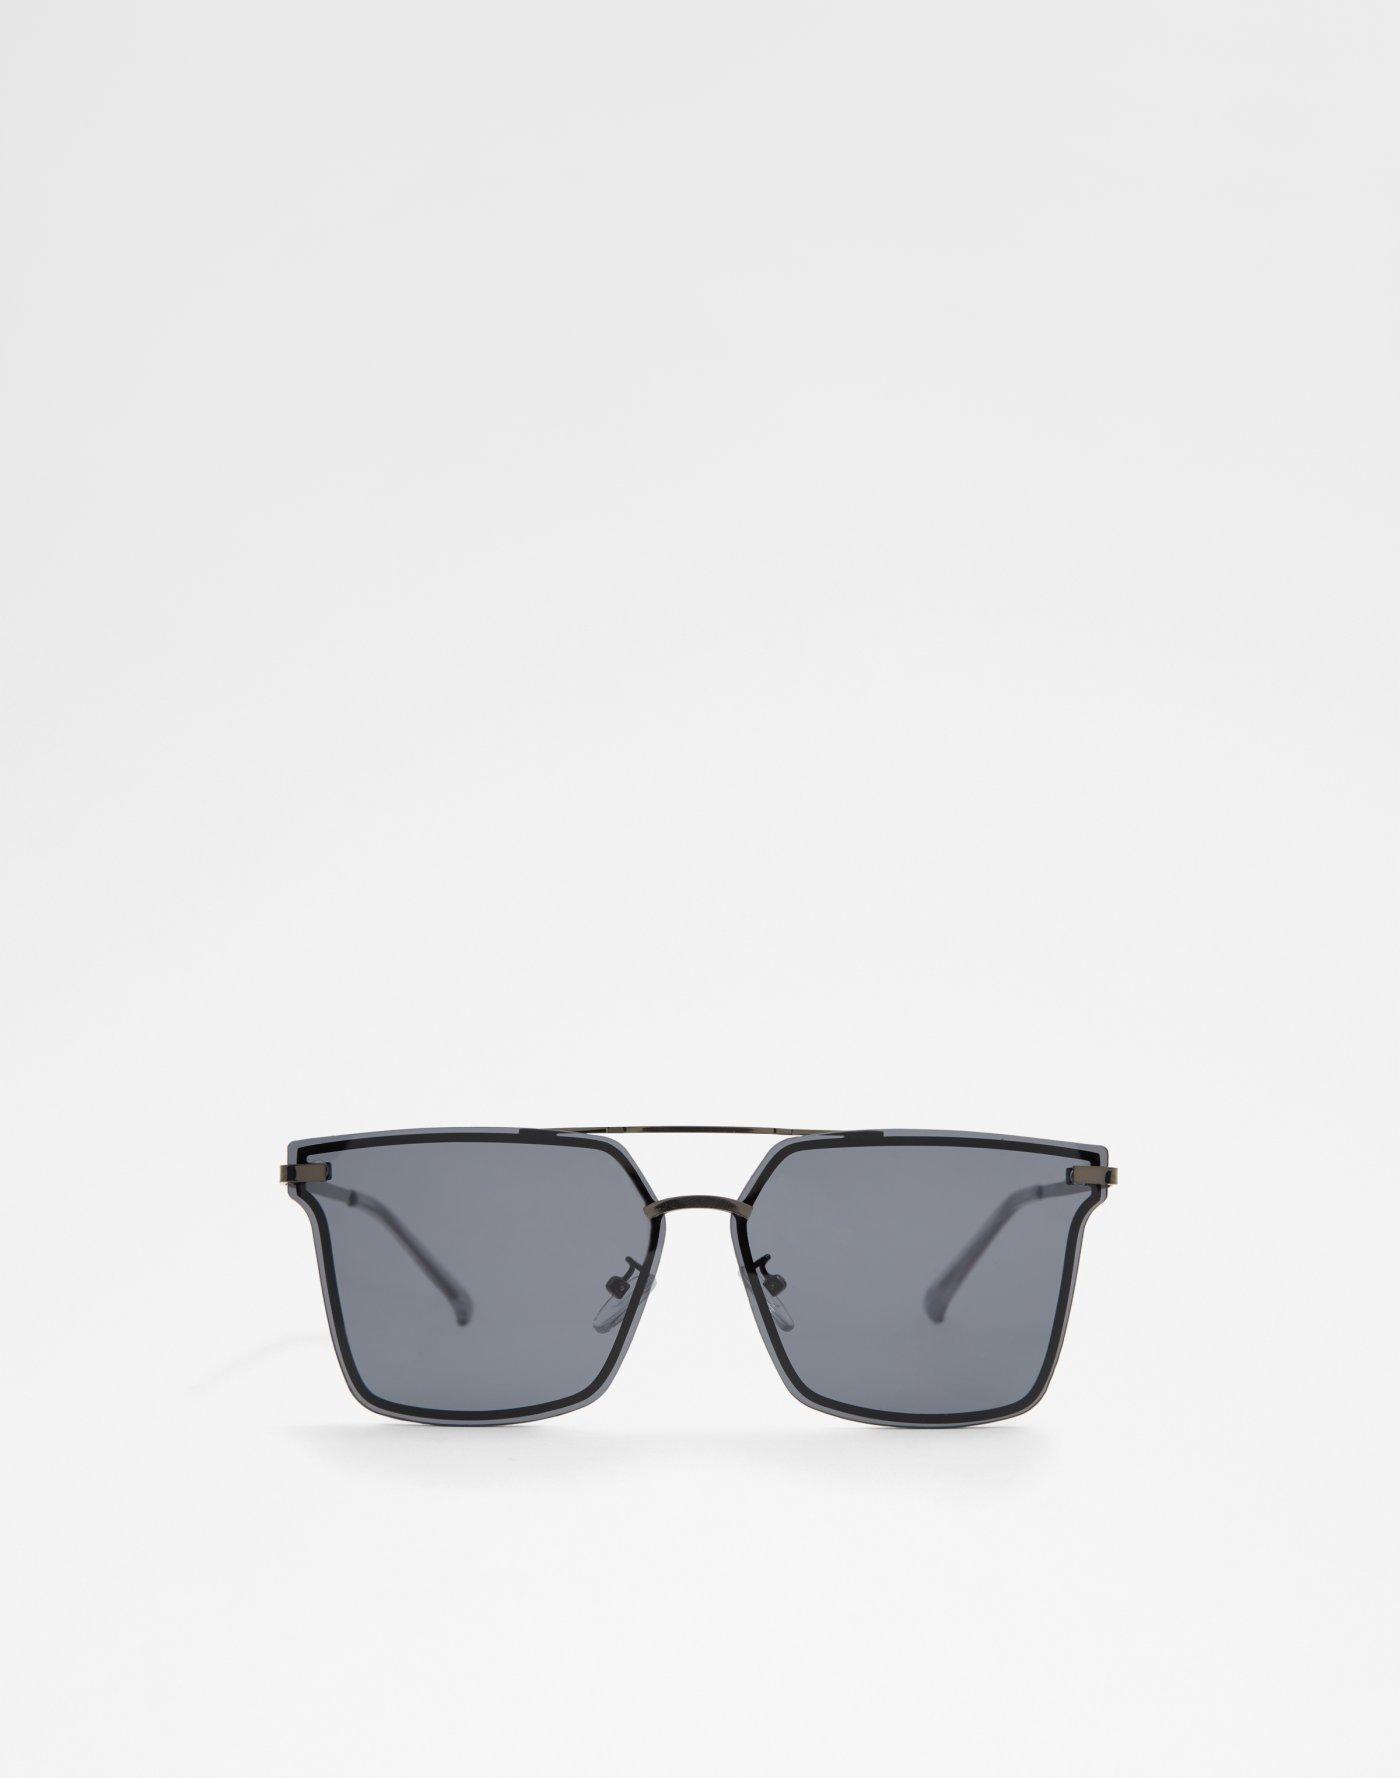 db40feba81c Sunglasses